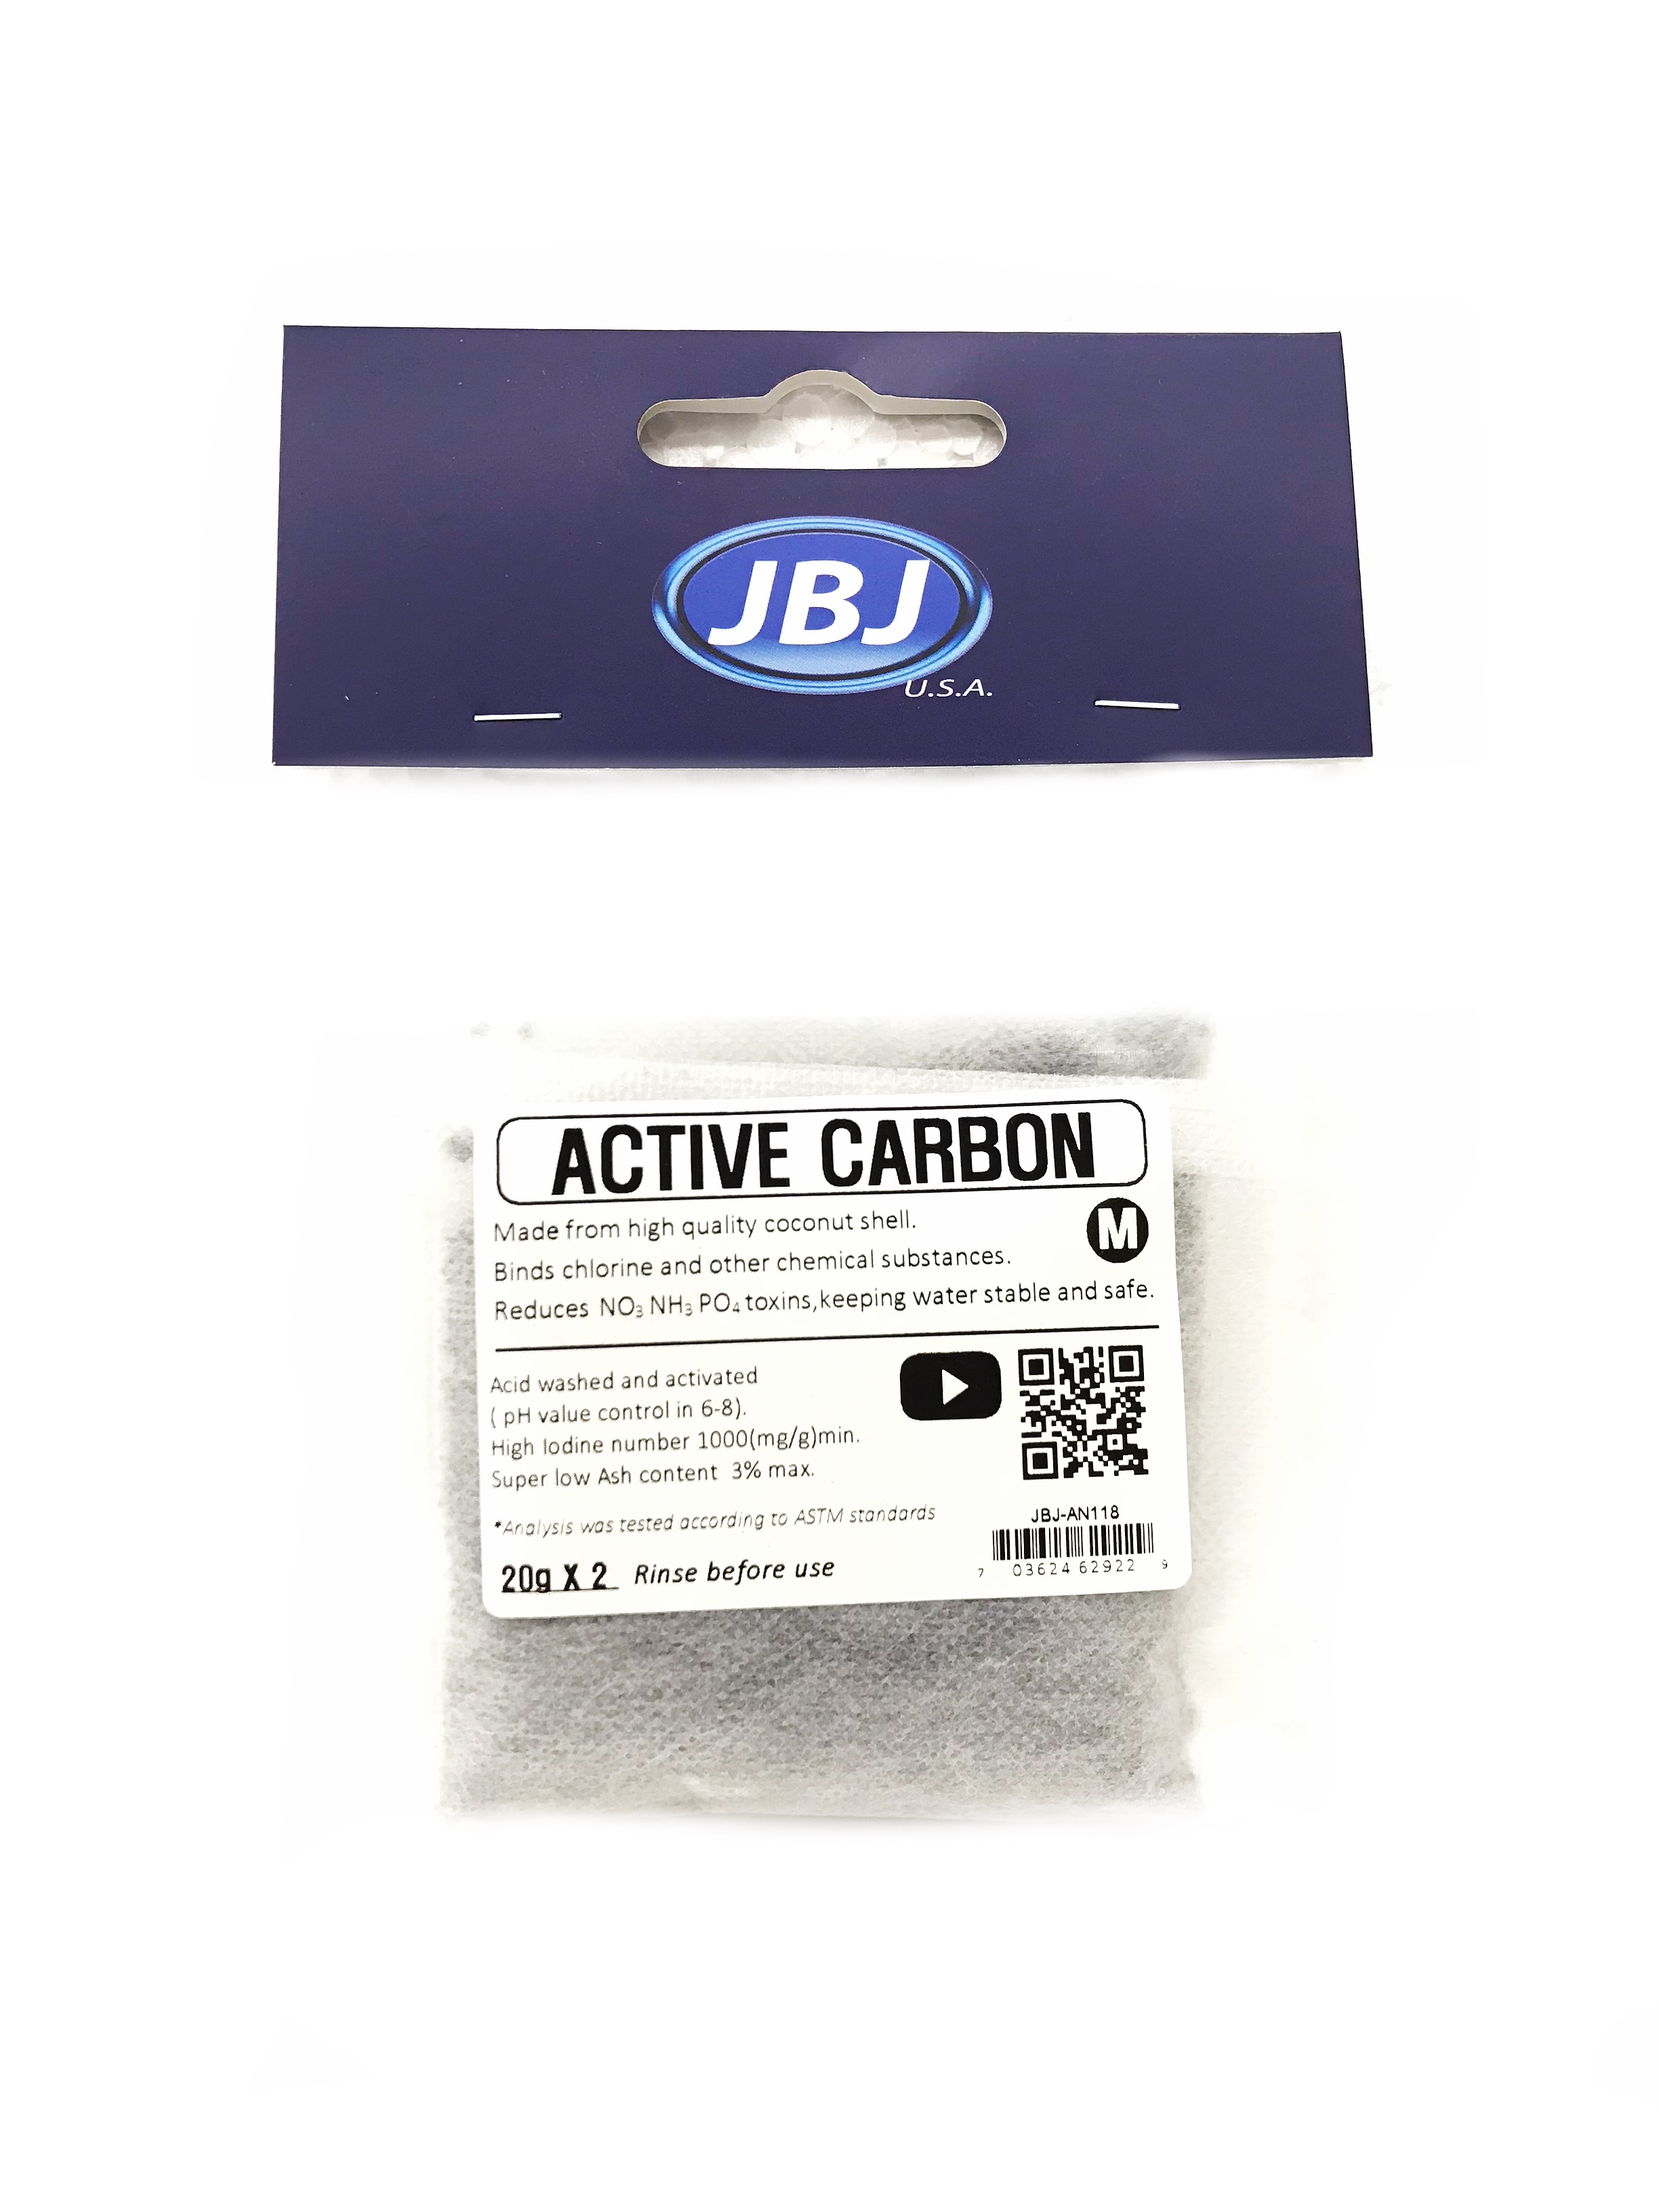 JBJ Active Carbon (20g x 2)